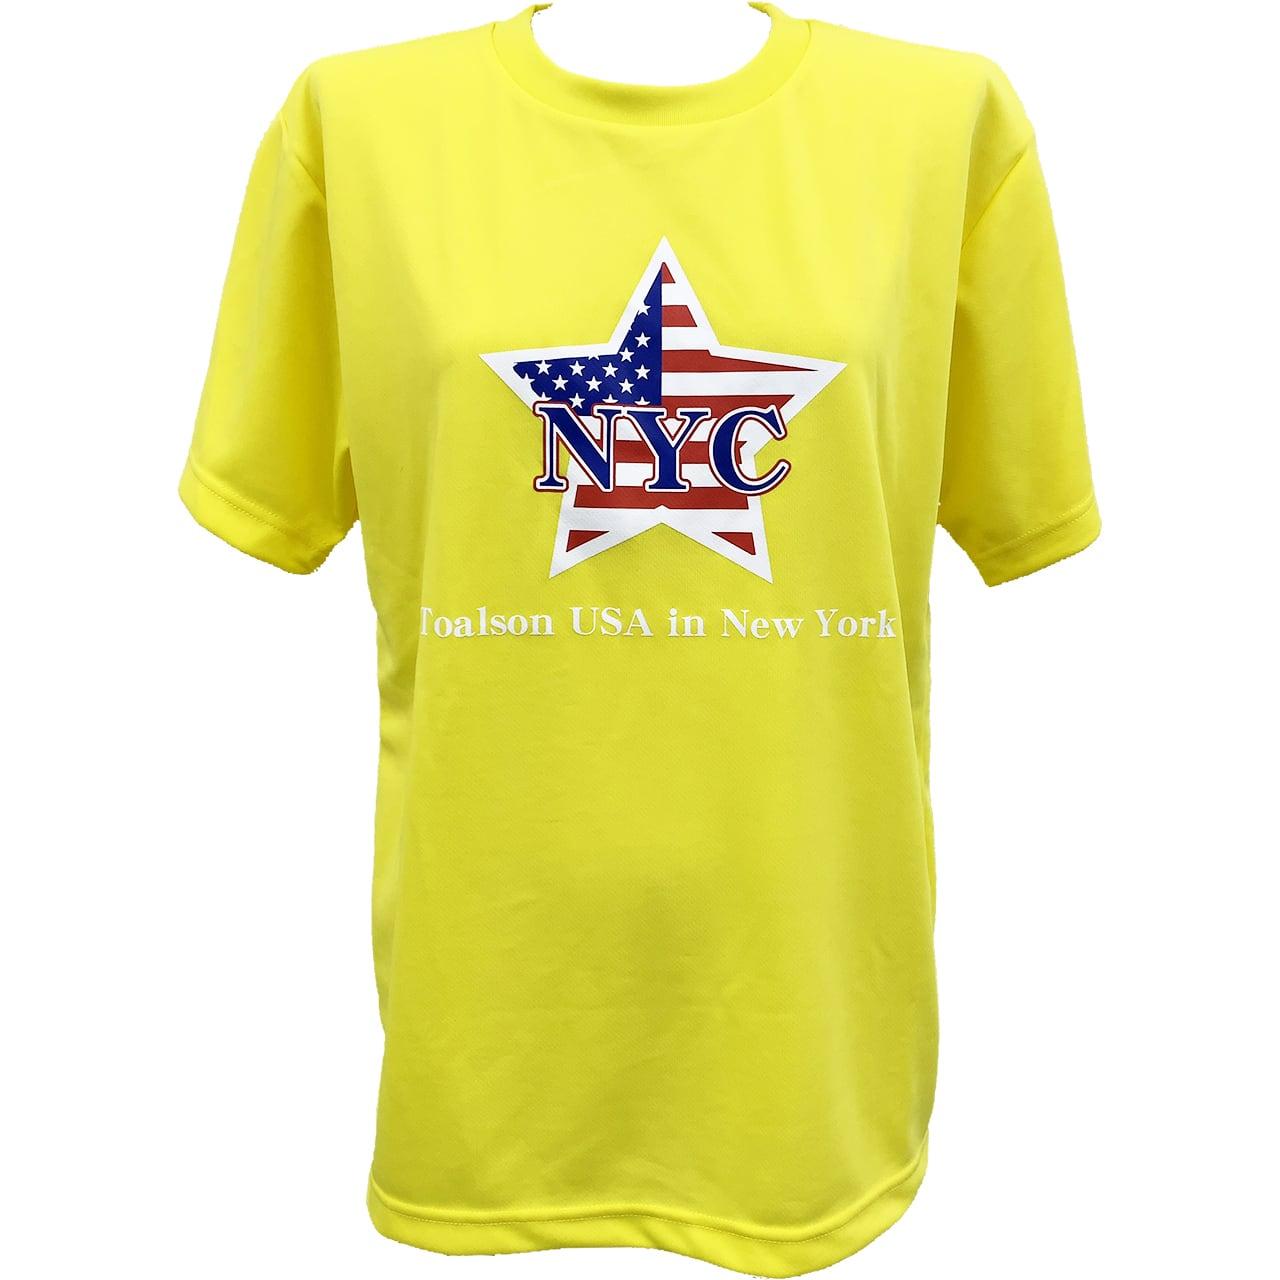 NYCTシャツ(イエロー)【1ET1911】